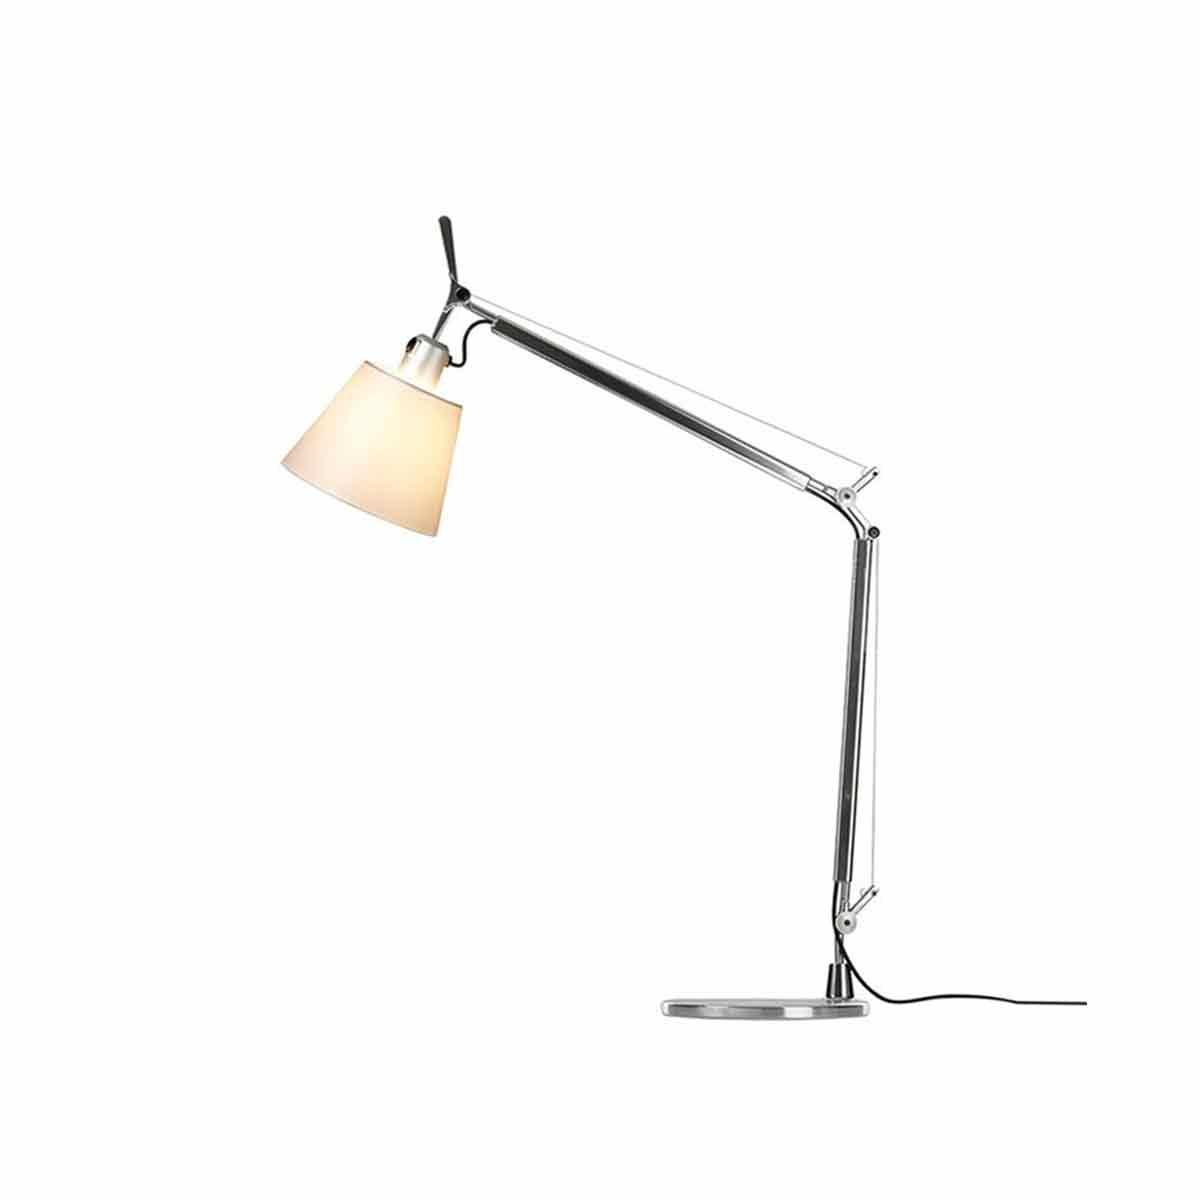 Stona lampa TOLOMEO BASCULANTE